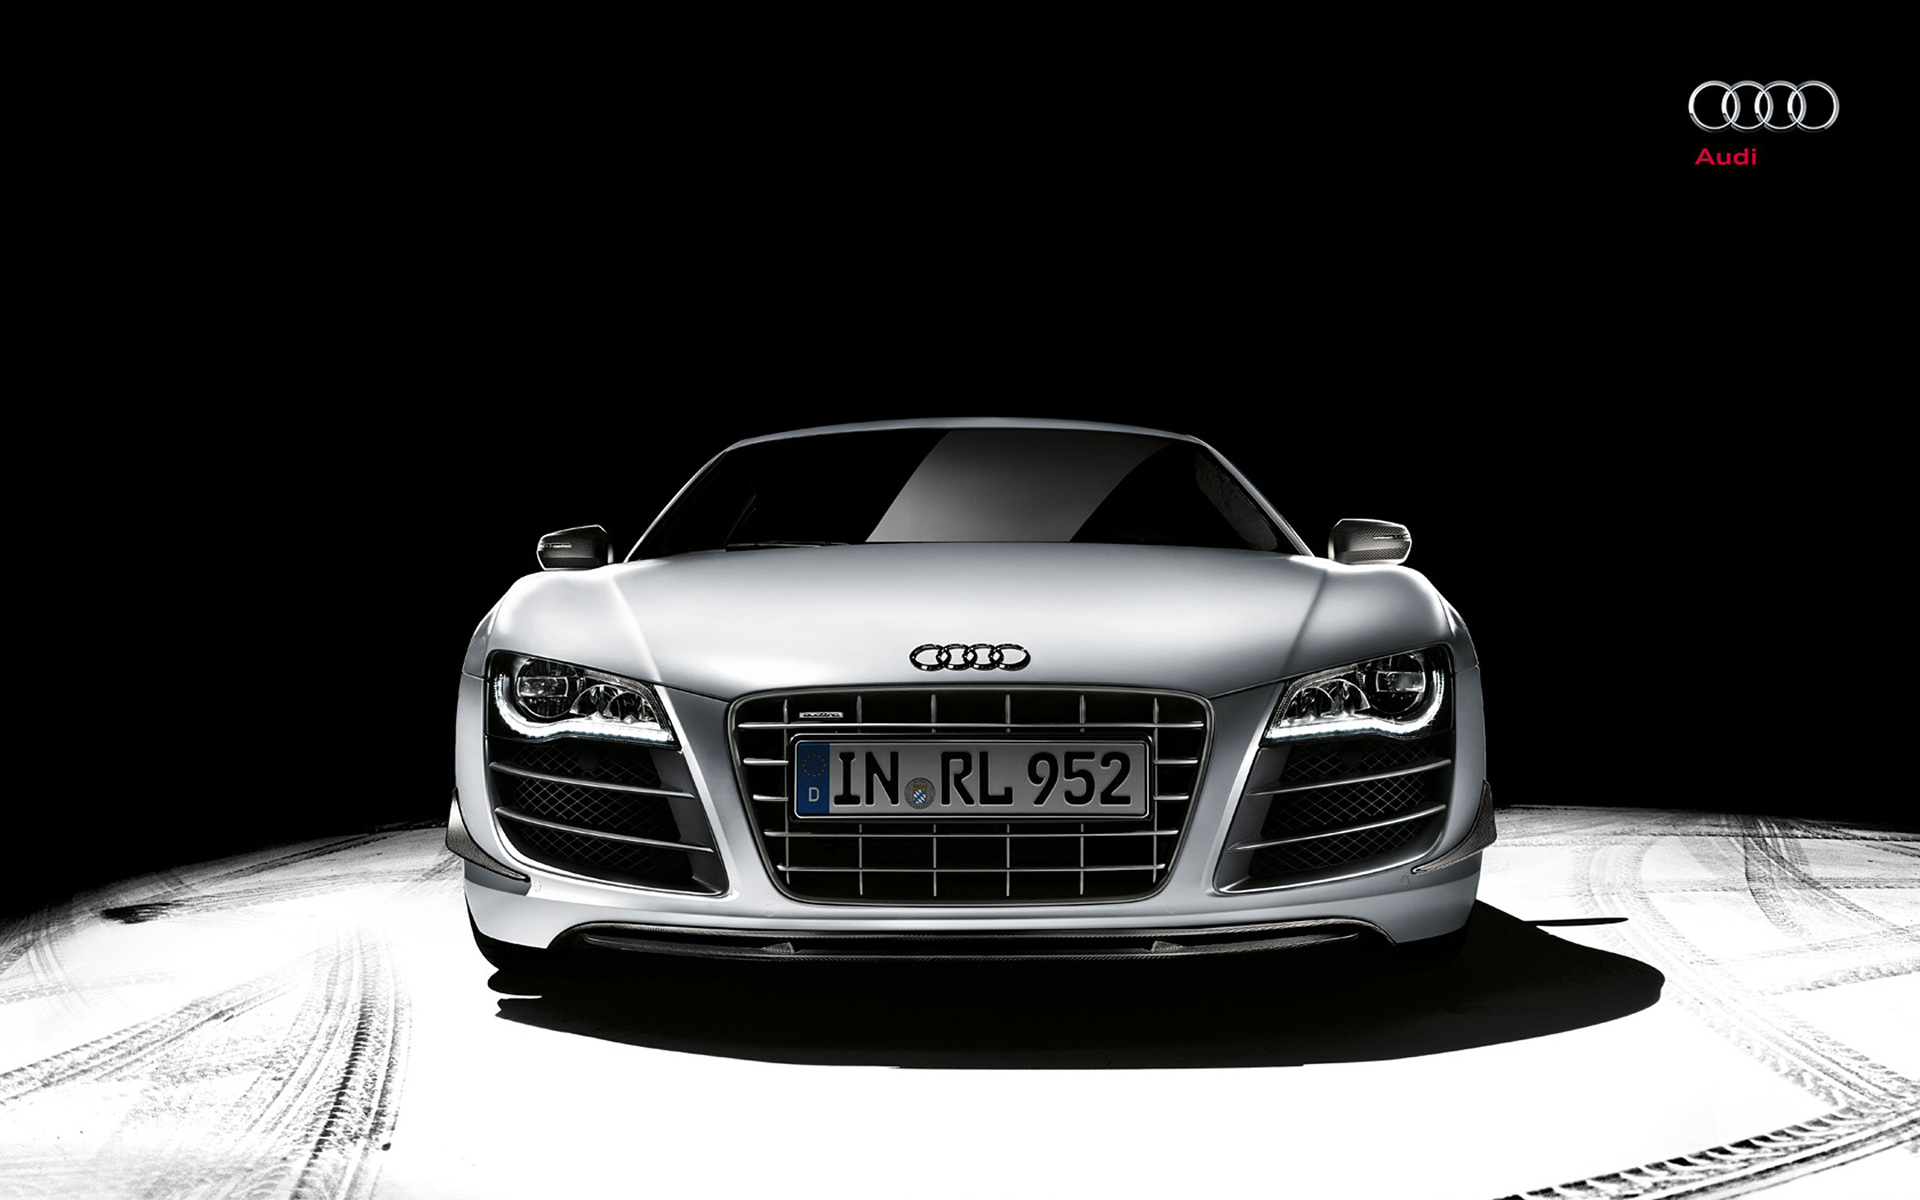 Audi R8 Gt HD Desktop Wallpaper HD Desktop Wallpaper 1920x1200